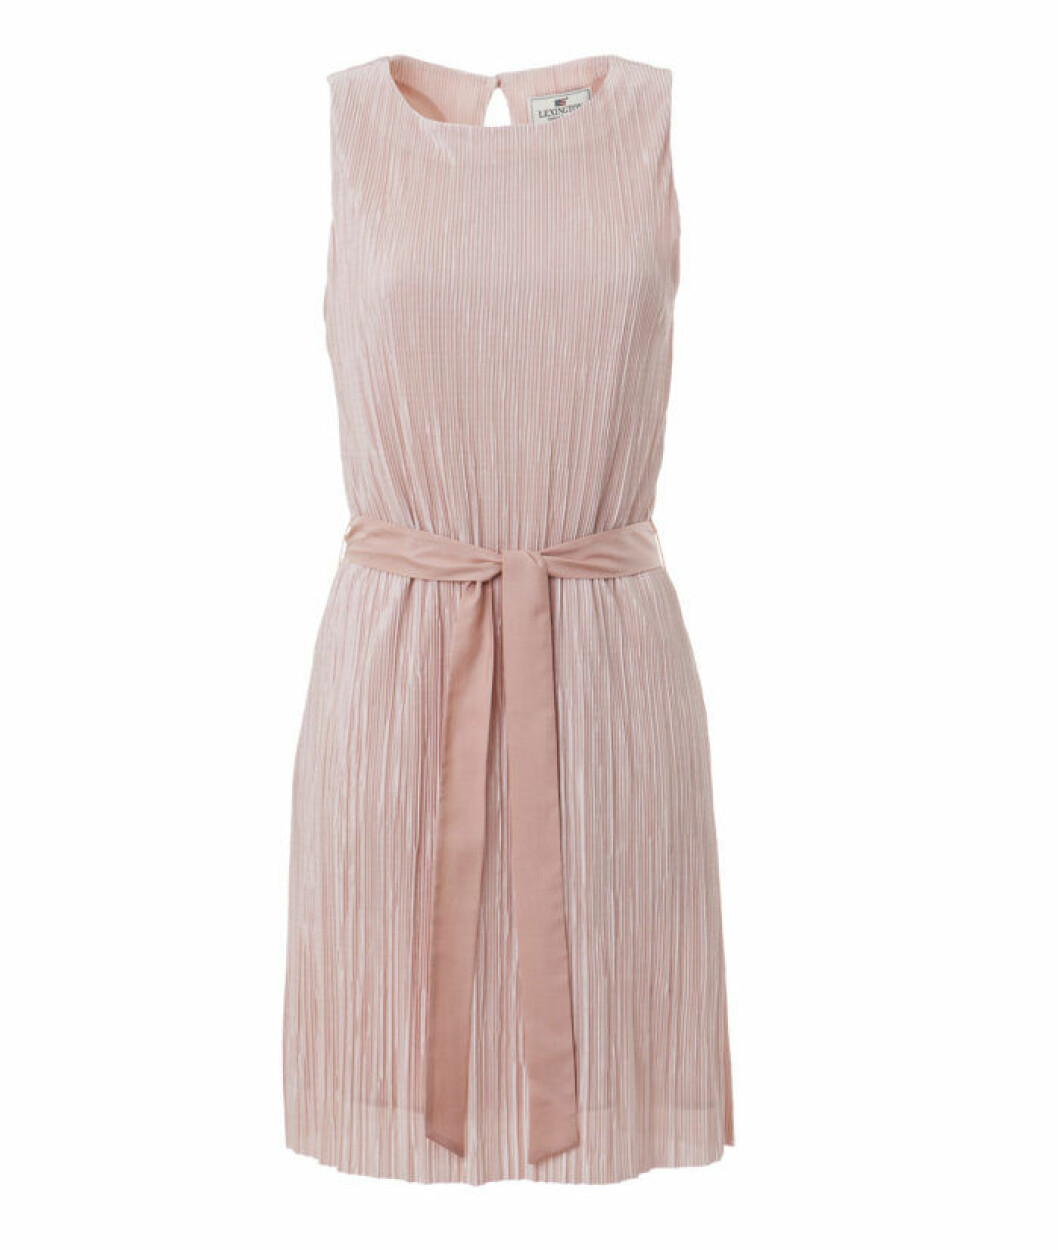 VALENTINA-PLISSE-DRESS-PINK